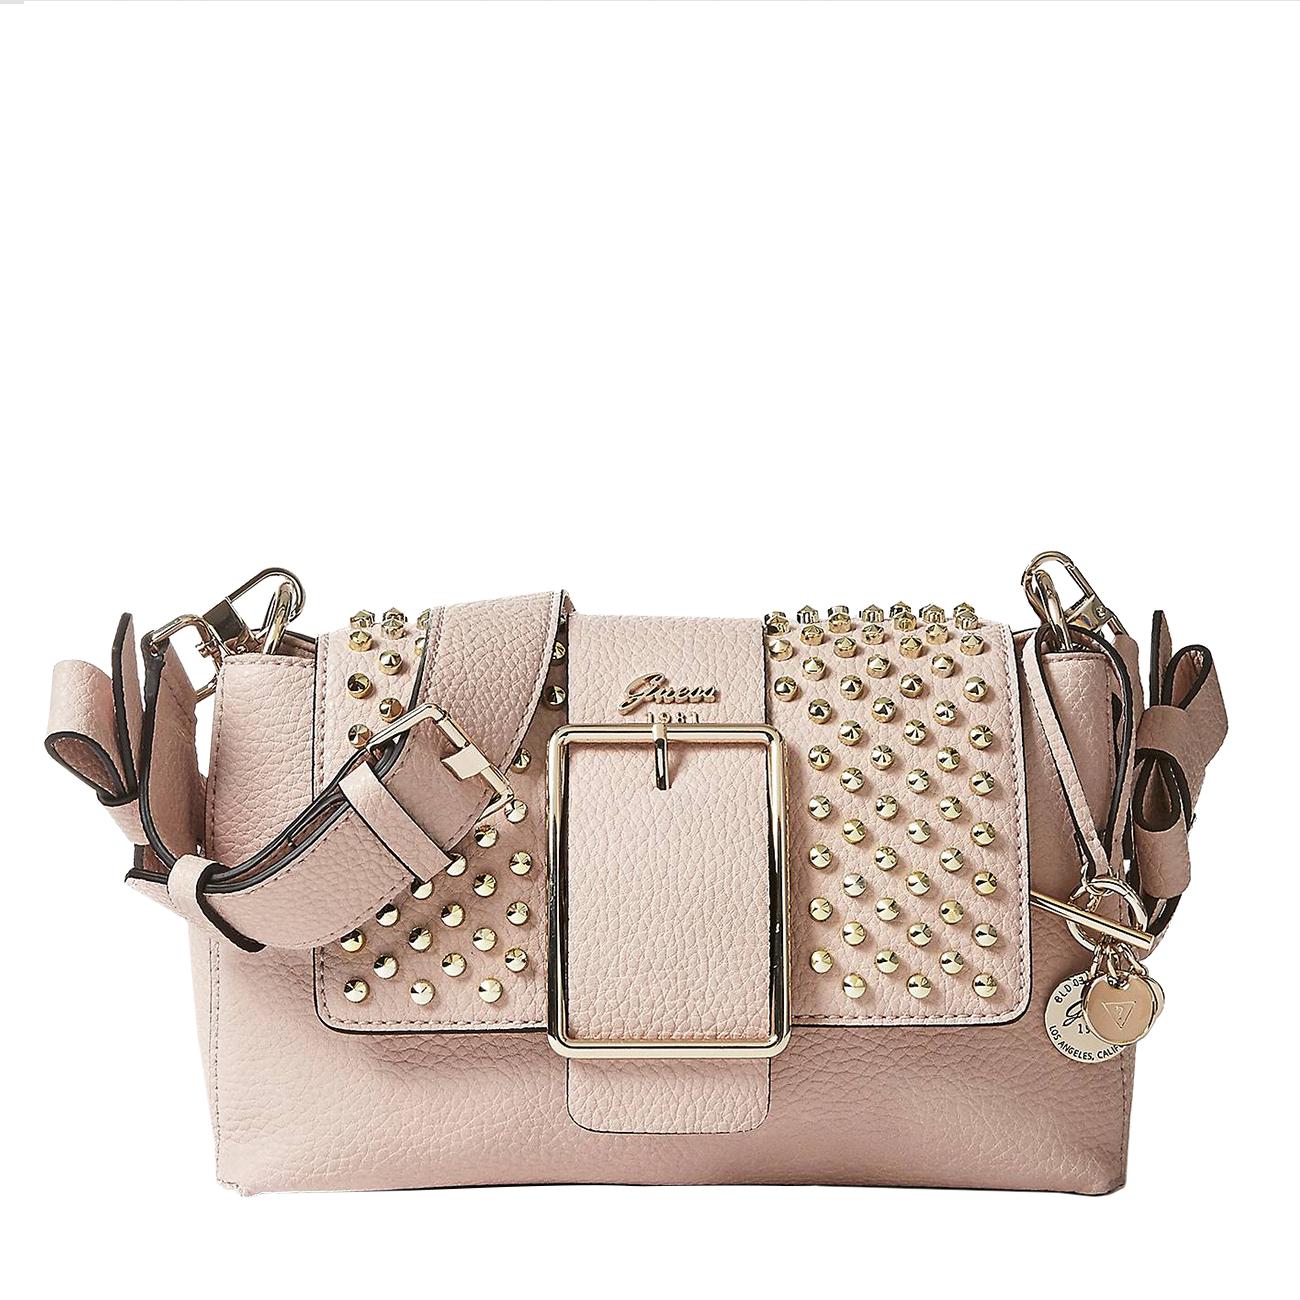 CAROLINE CROSSBODY BAG